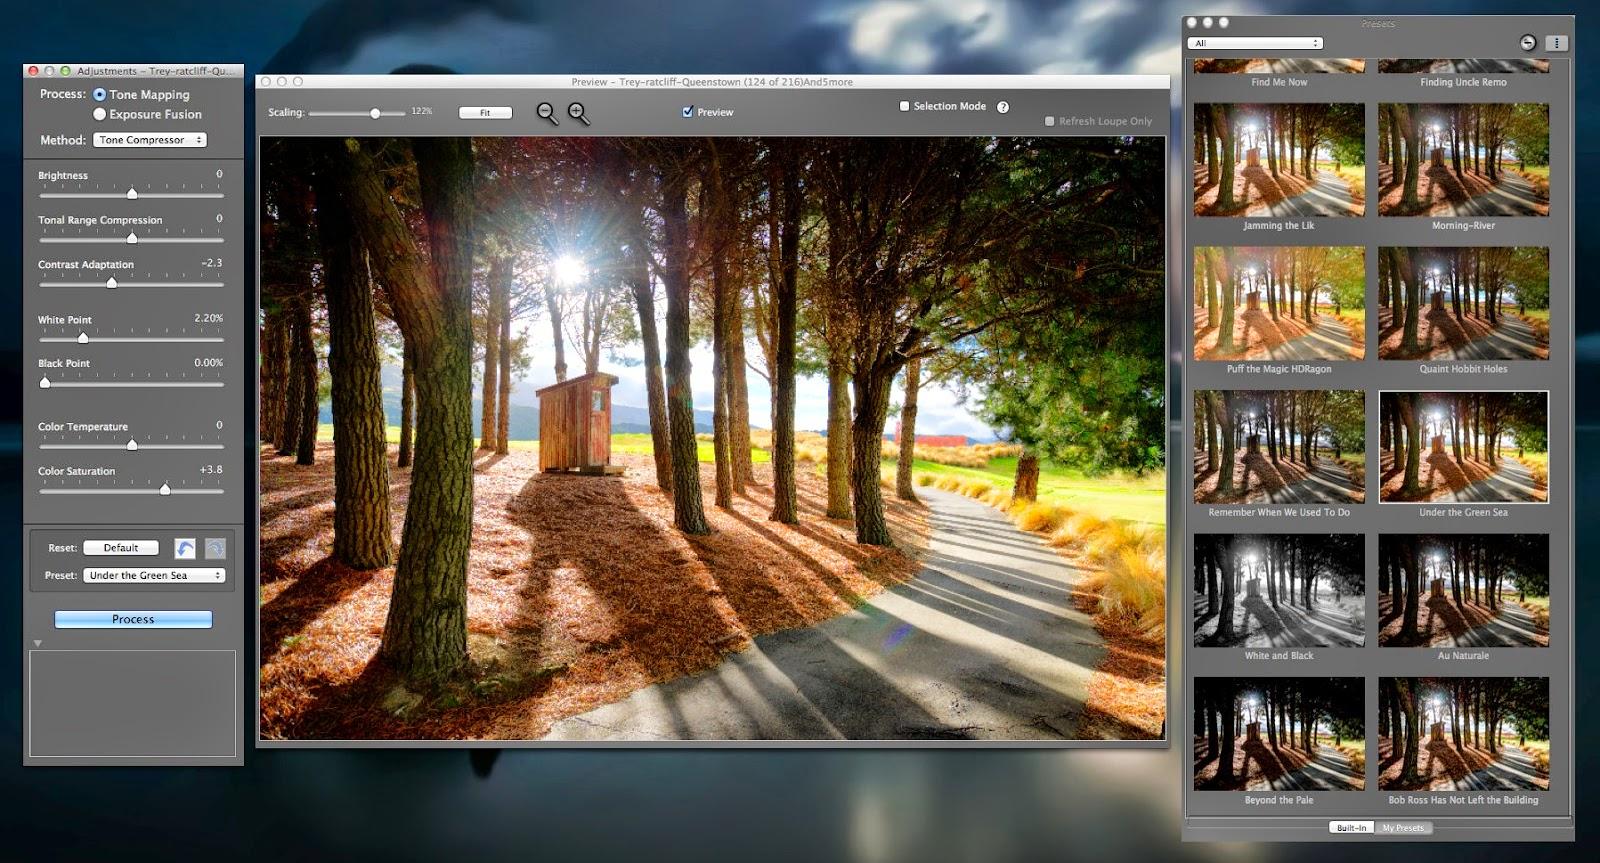 photomatix pro 5.0 64 bit license key